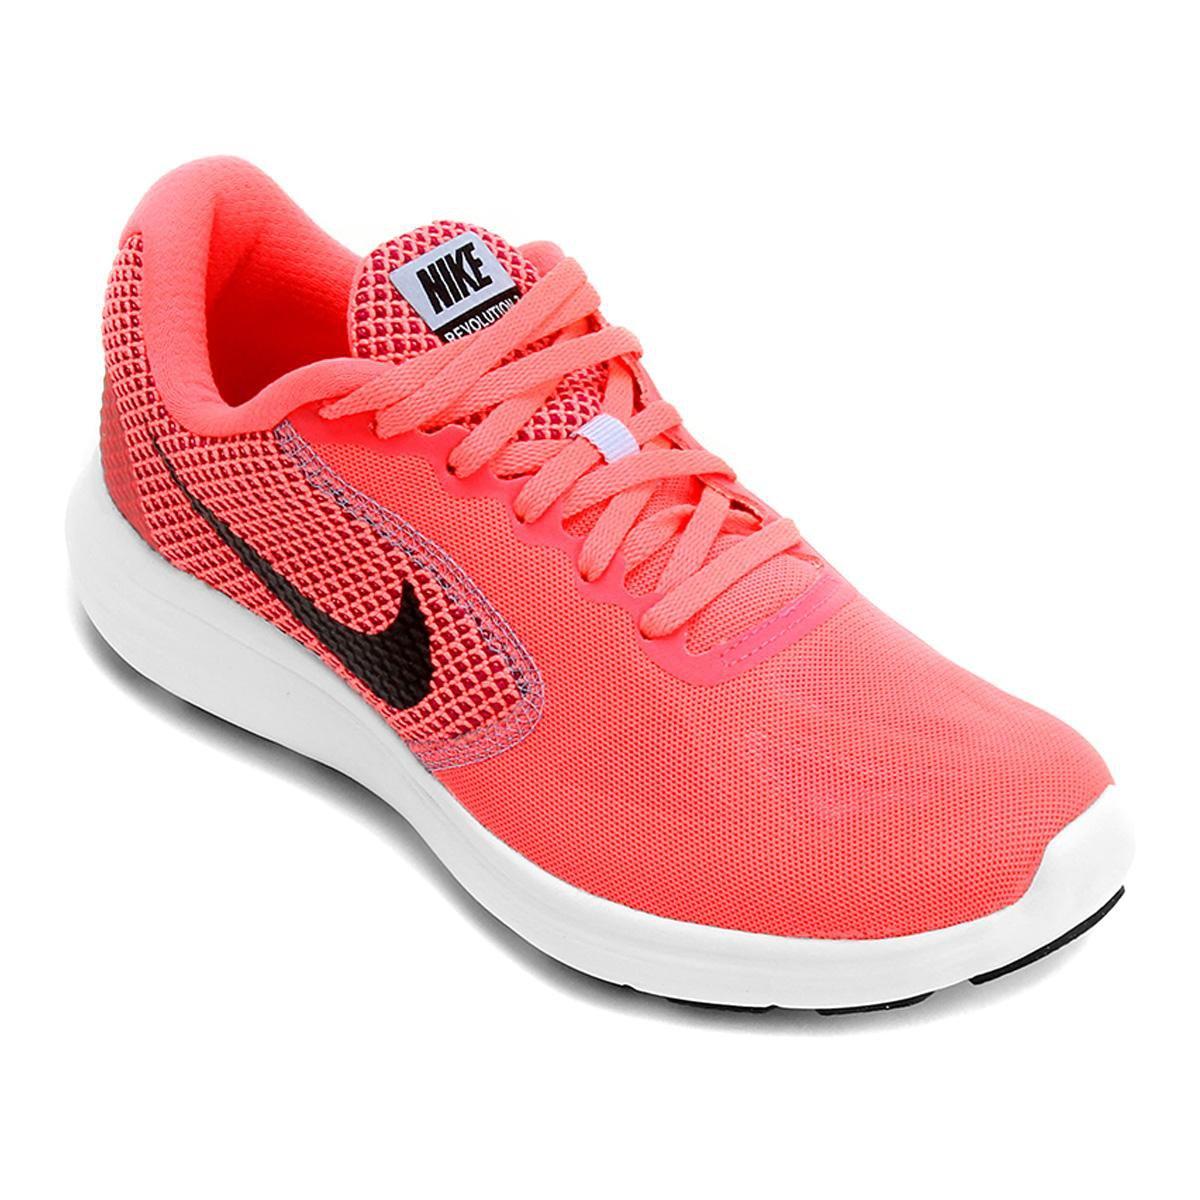 eb7415fb0c ... promo code tênis nike revolution 3 feminino pink 8d6fe 596f6 ...